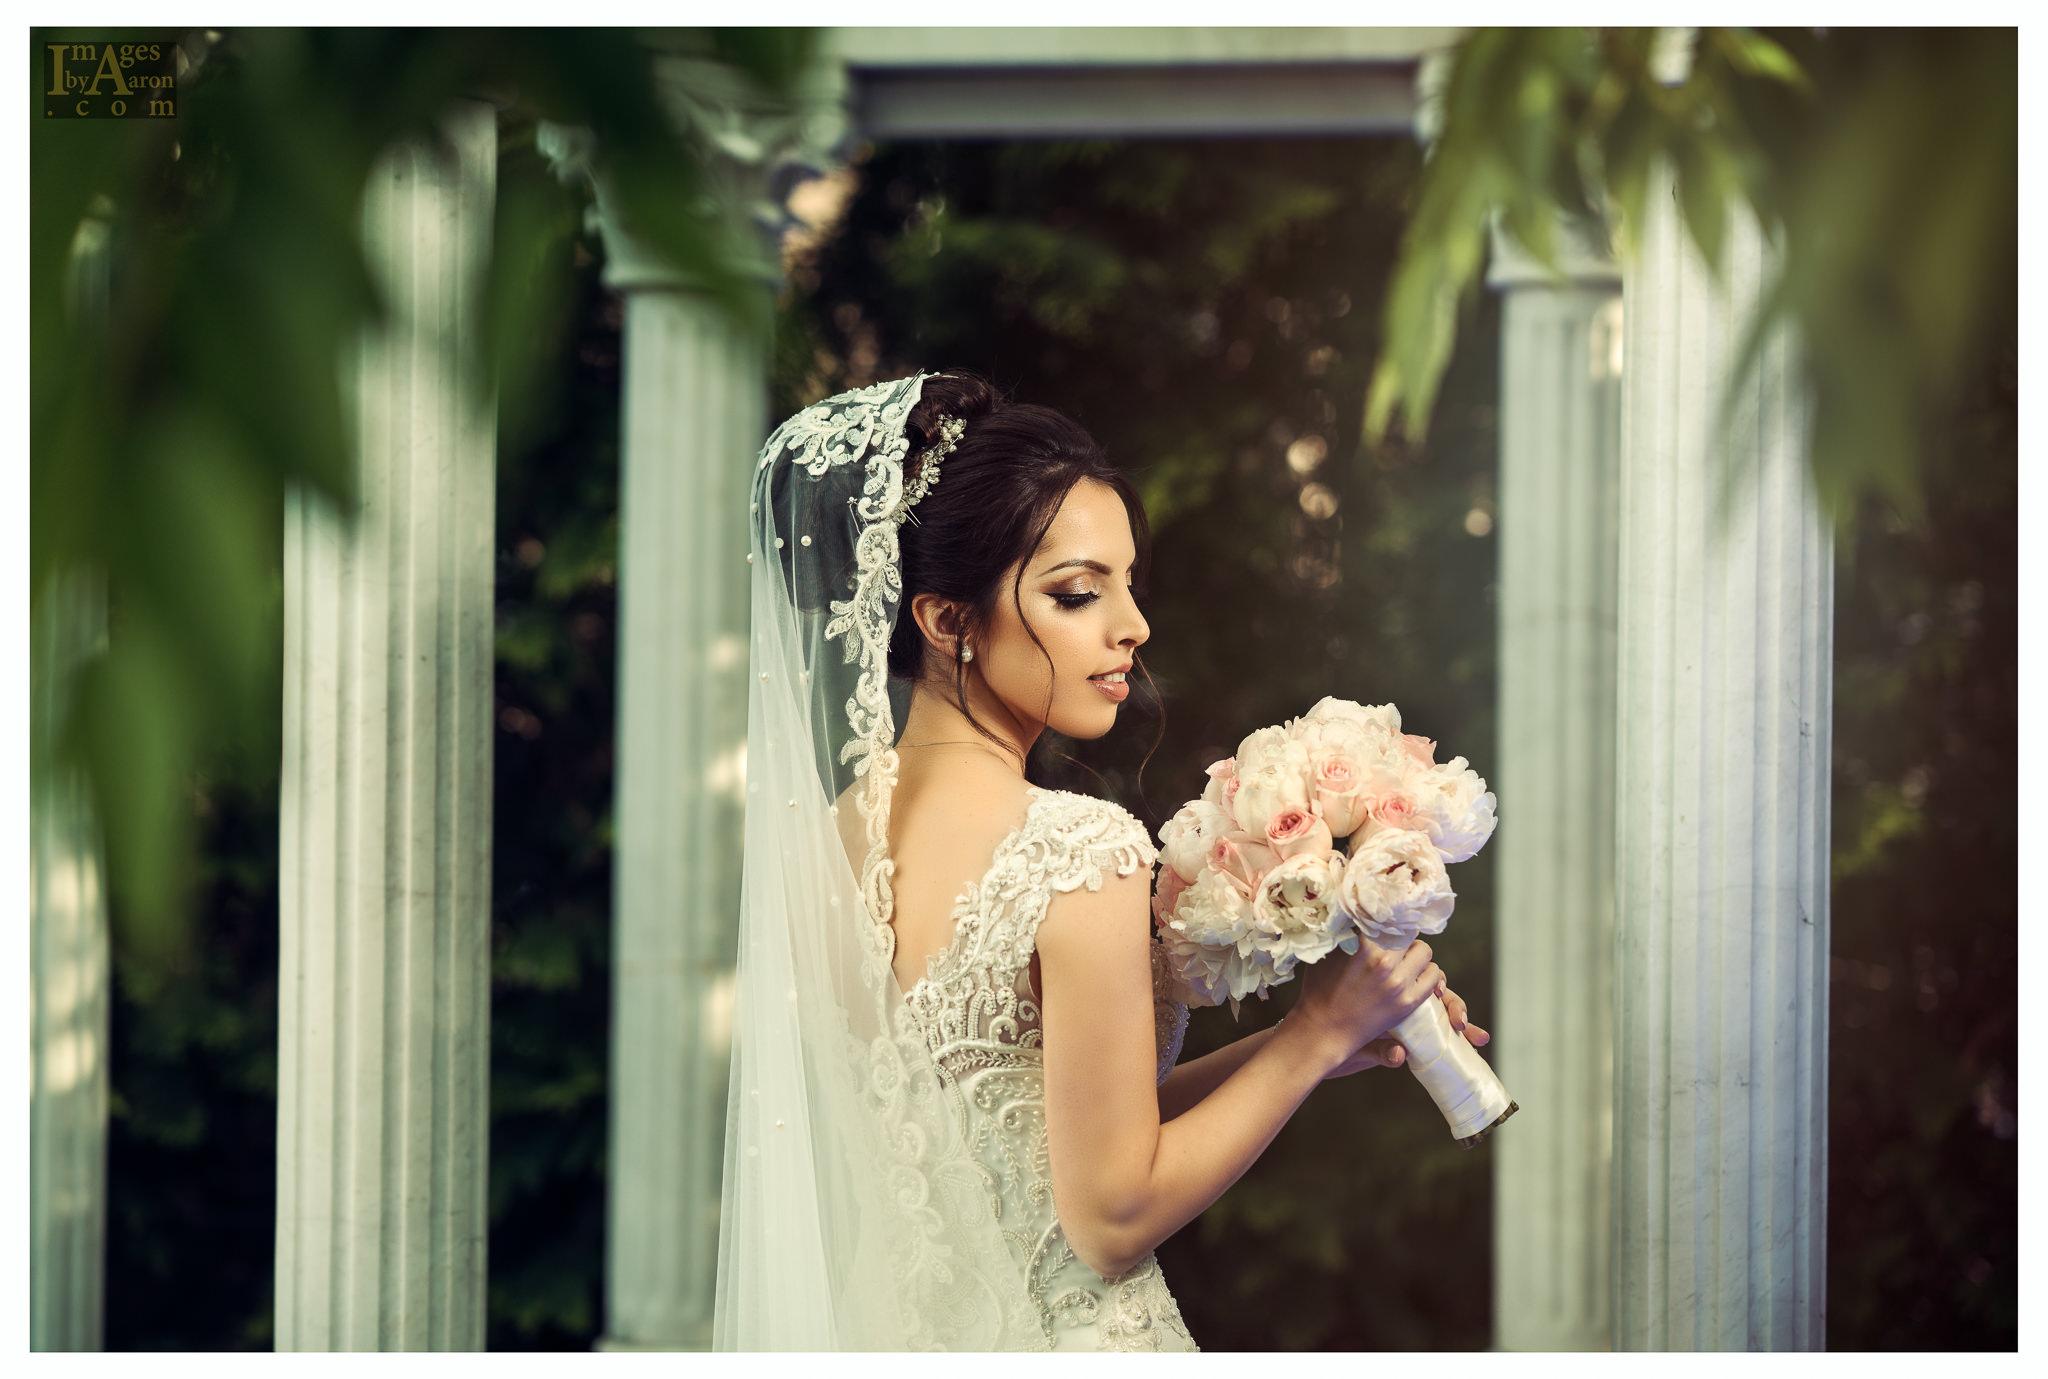 Gokce Turkish Wedding Portraits New York Photography The Royal Manor-11.jpg